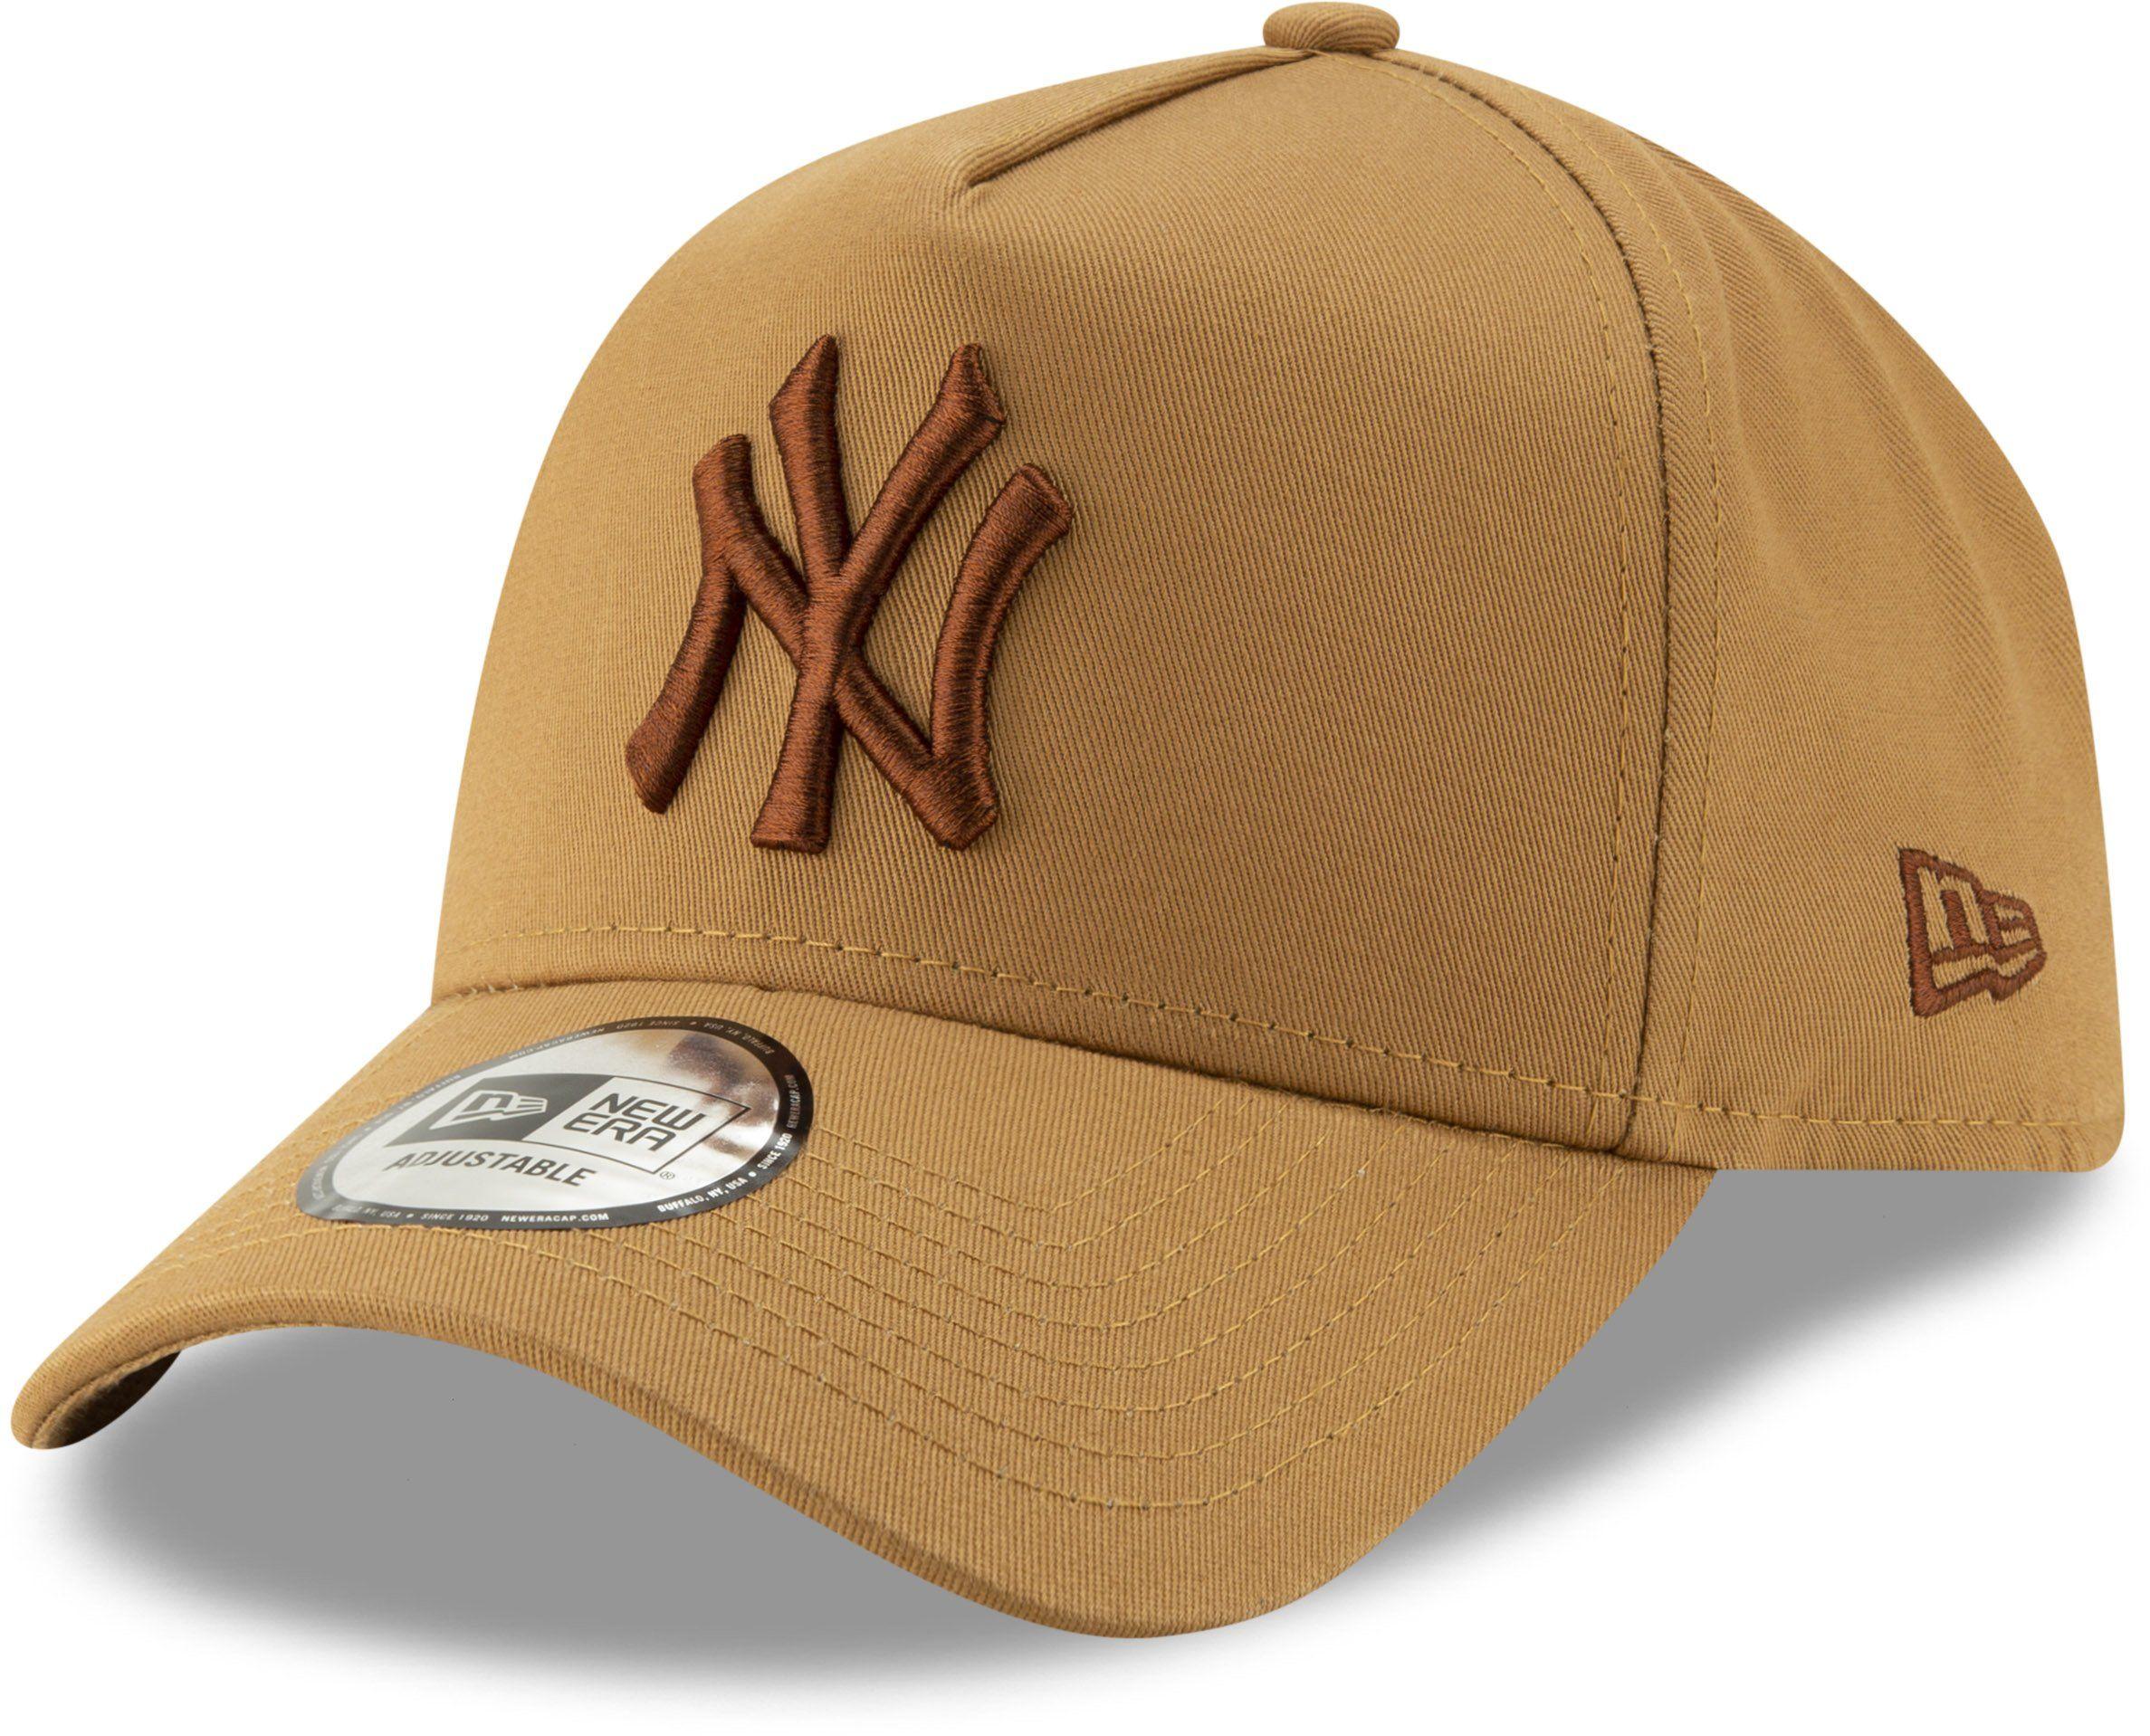 6f329bbb5 NY Yankees New Era Leaue Essential A-Frame Baseball Cap - Wheat ...